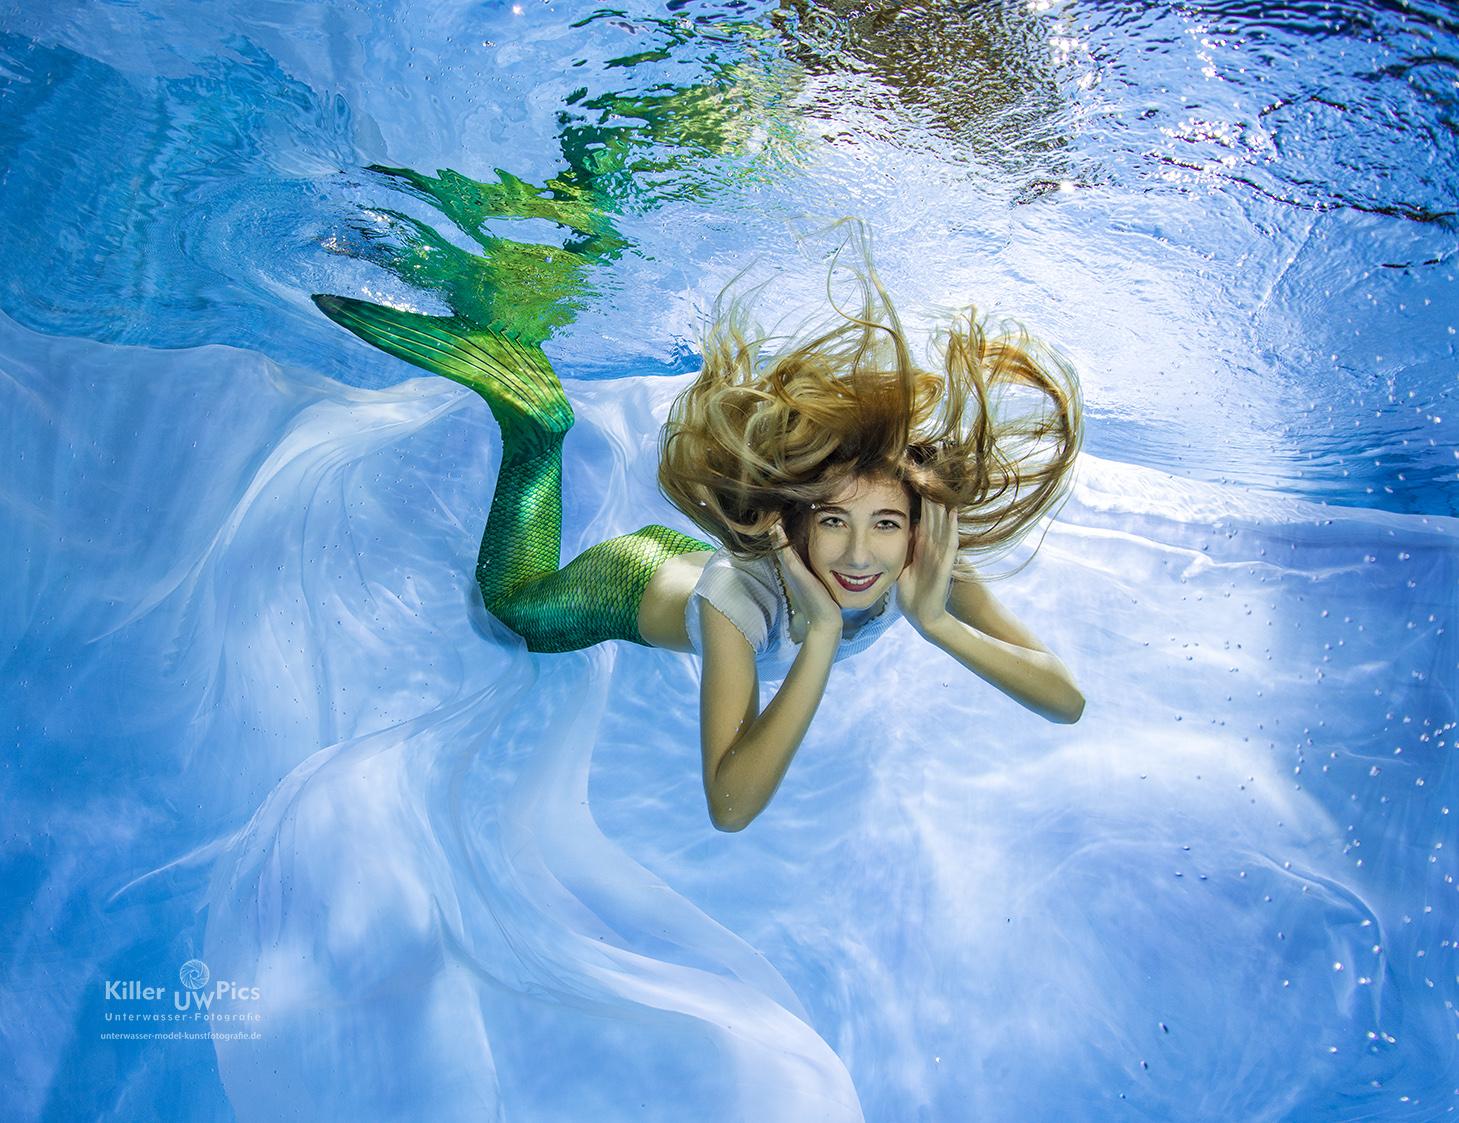 (C) Fotograf: Konstantin Killer, Unterwasser Shooting